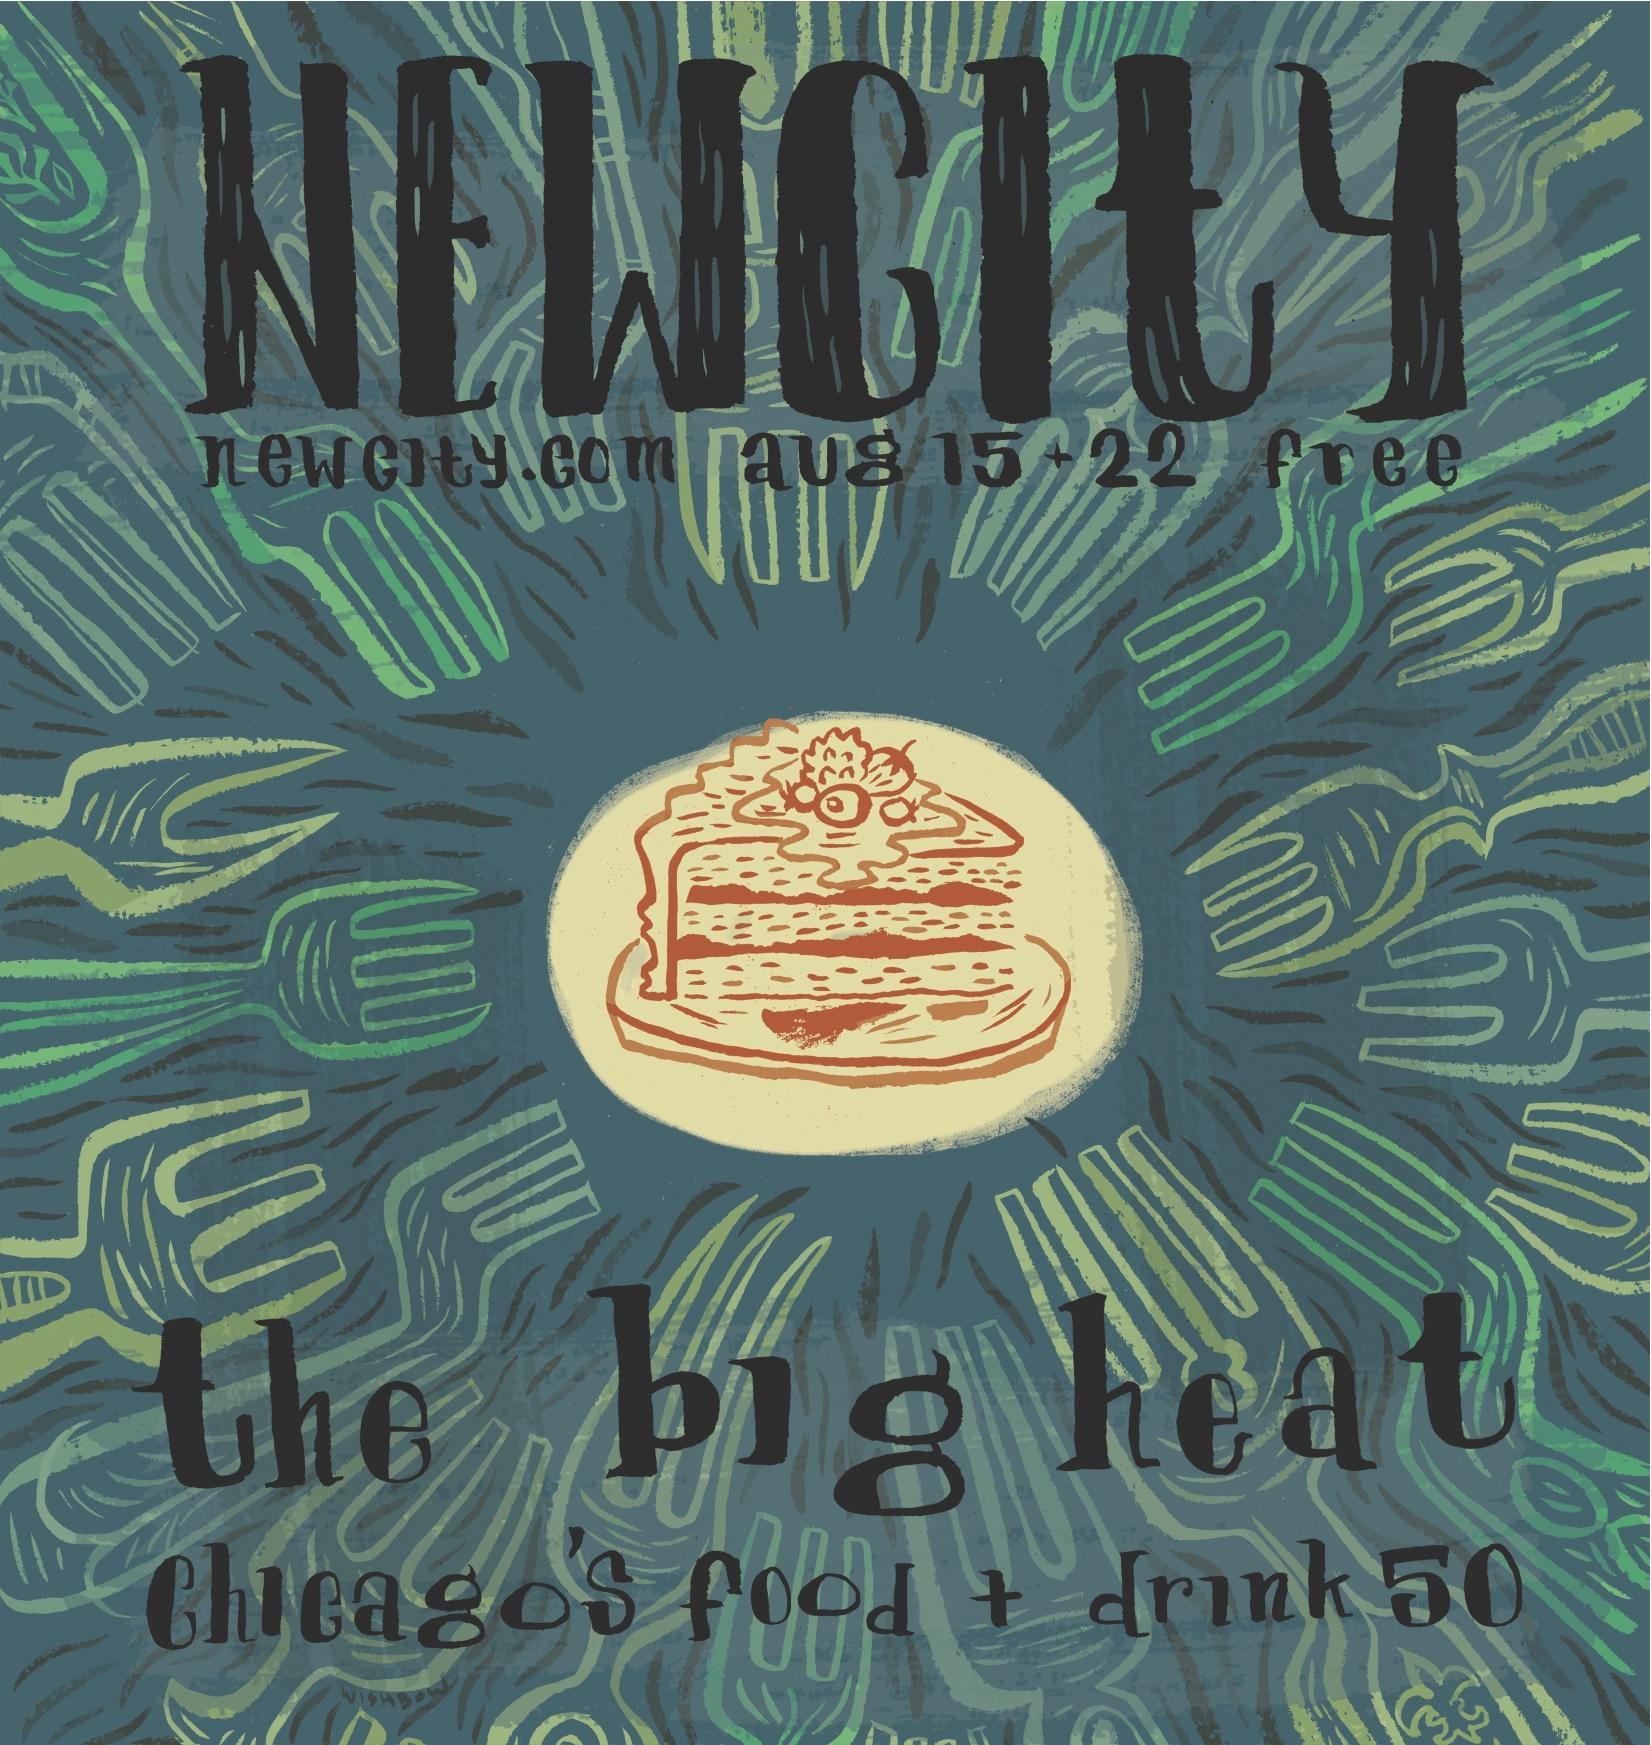 The Big Heat: Chicago's Food & Drink 50